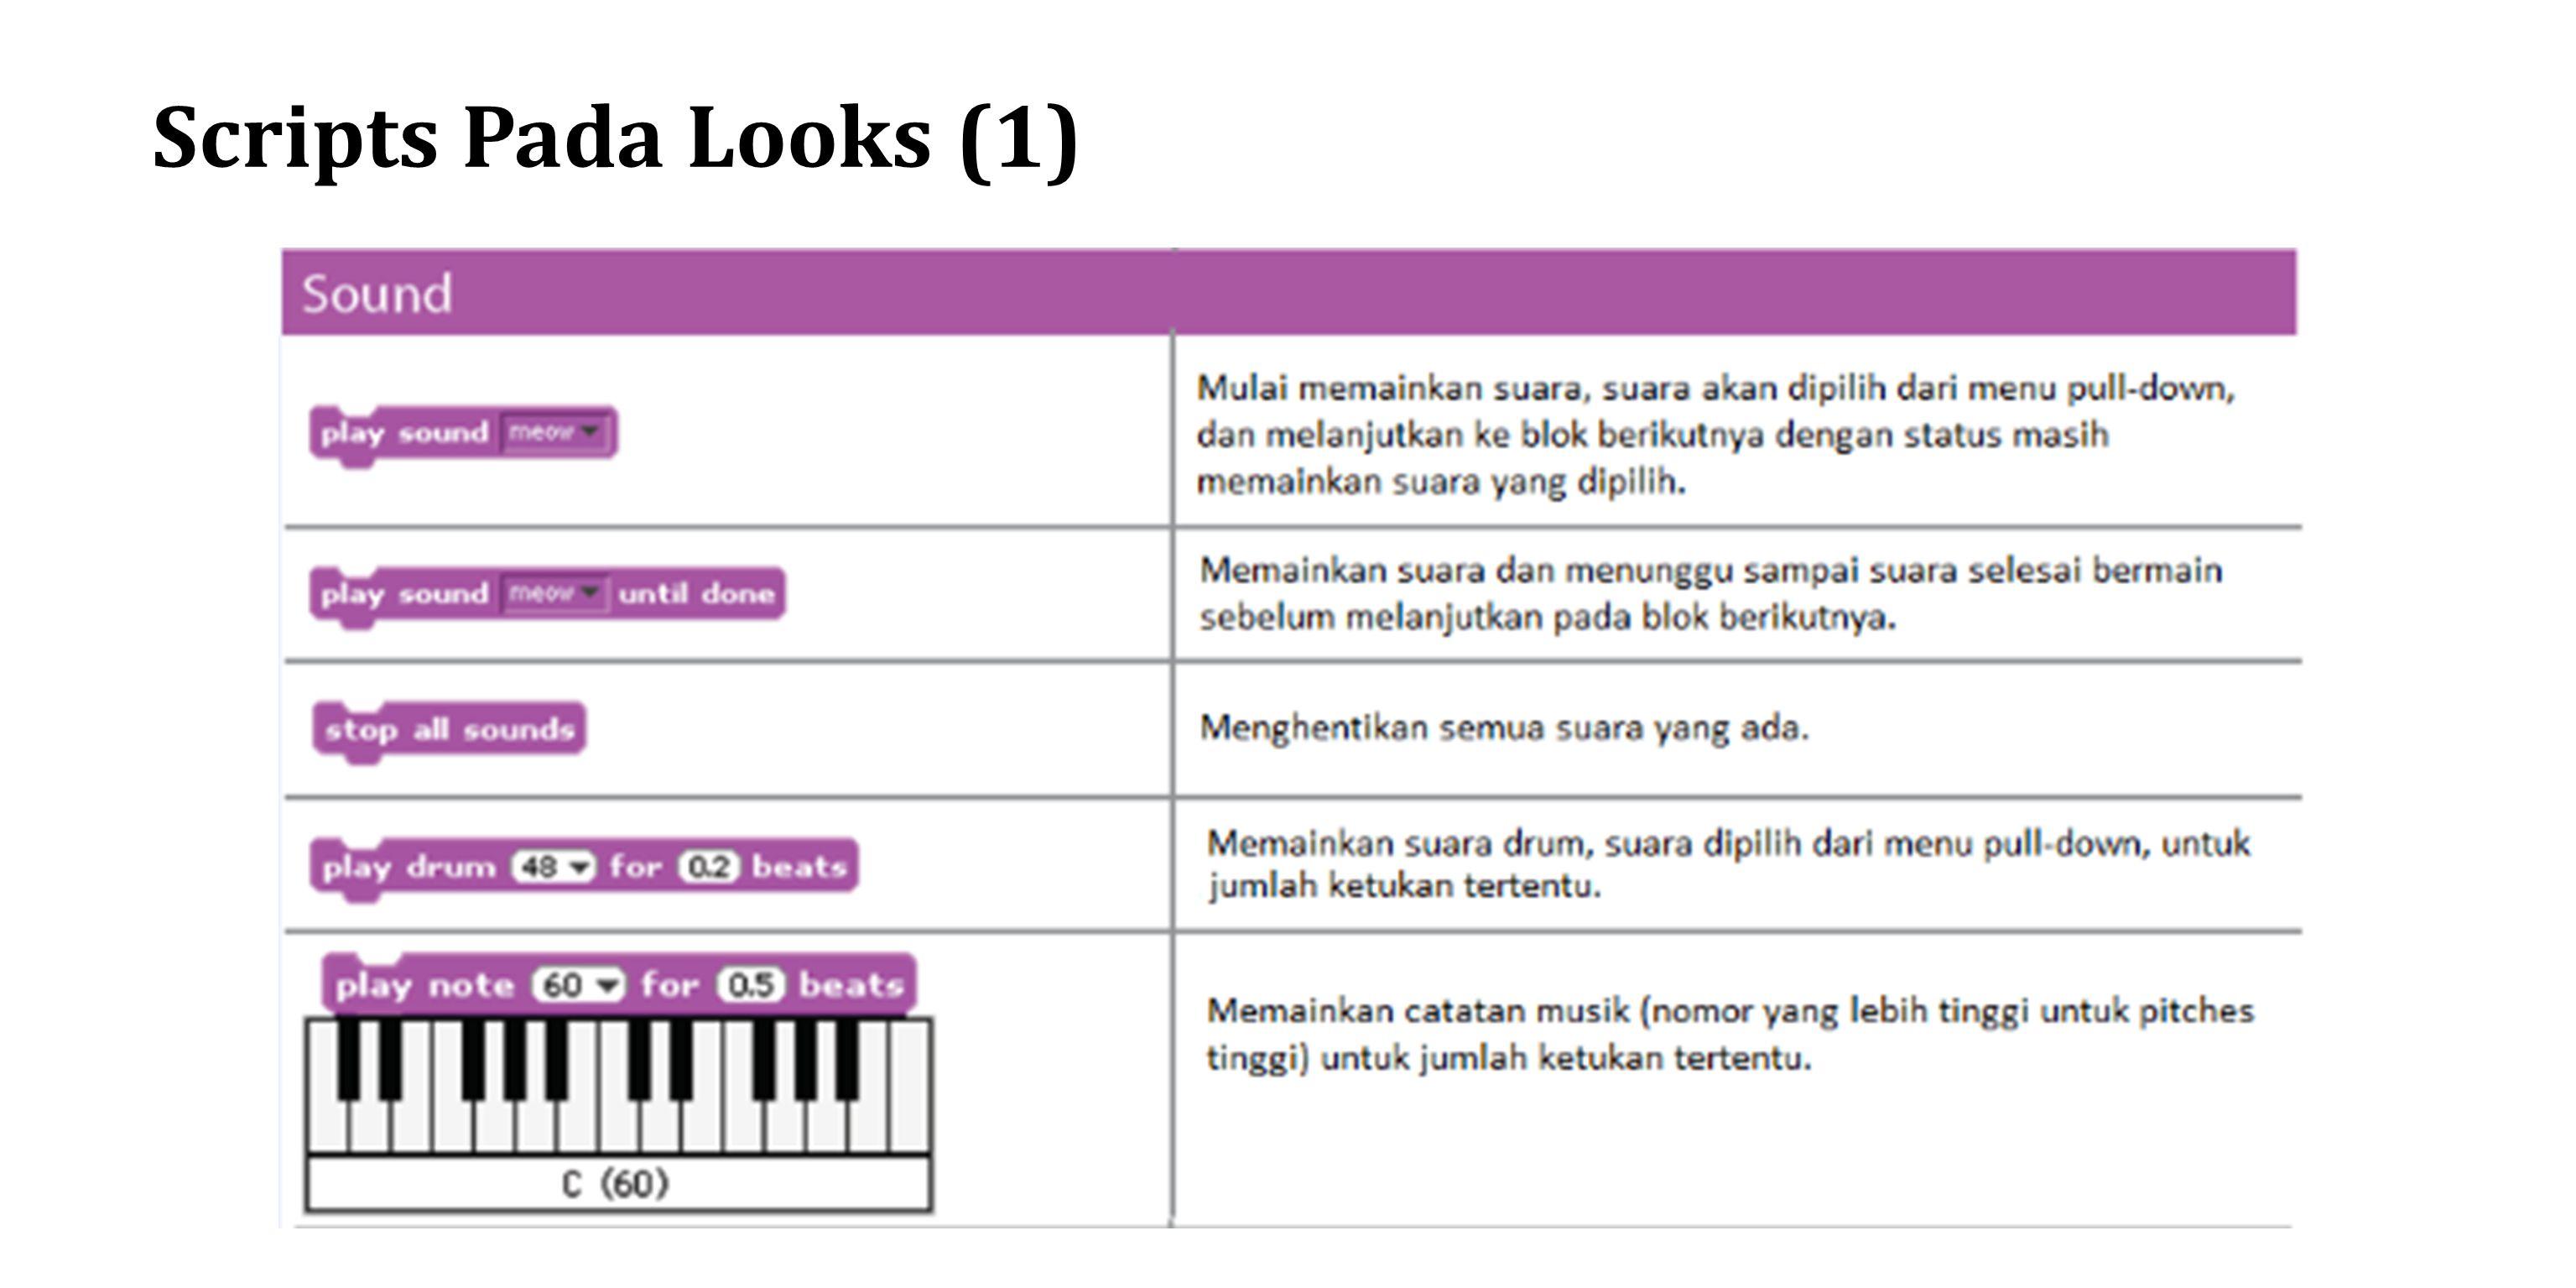 Scripts Pada Looks (2)